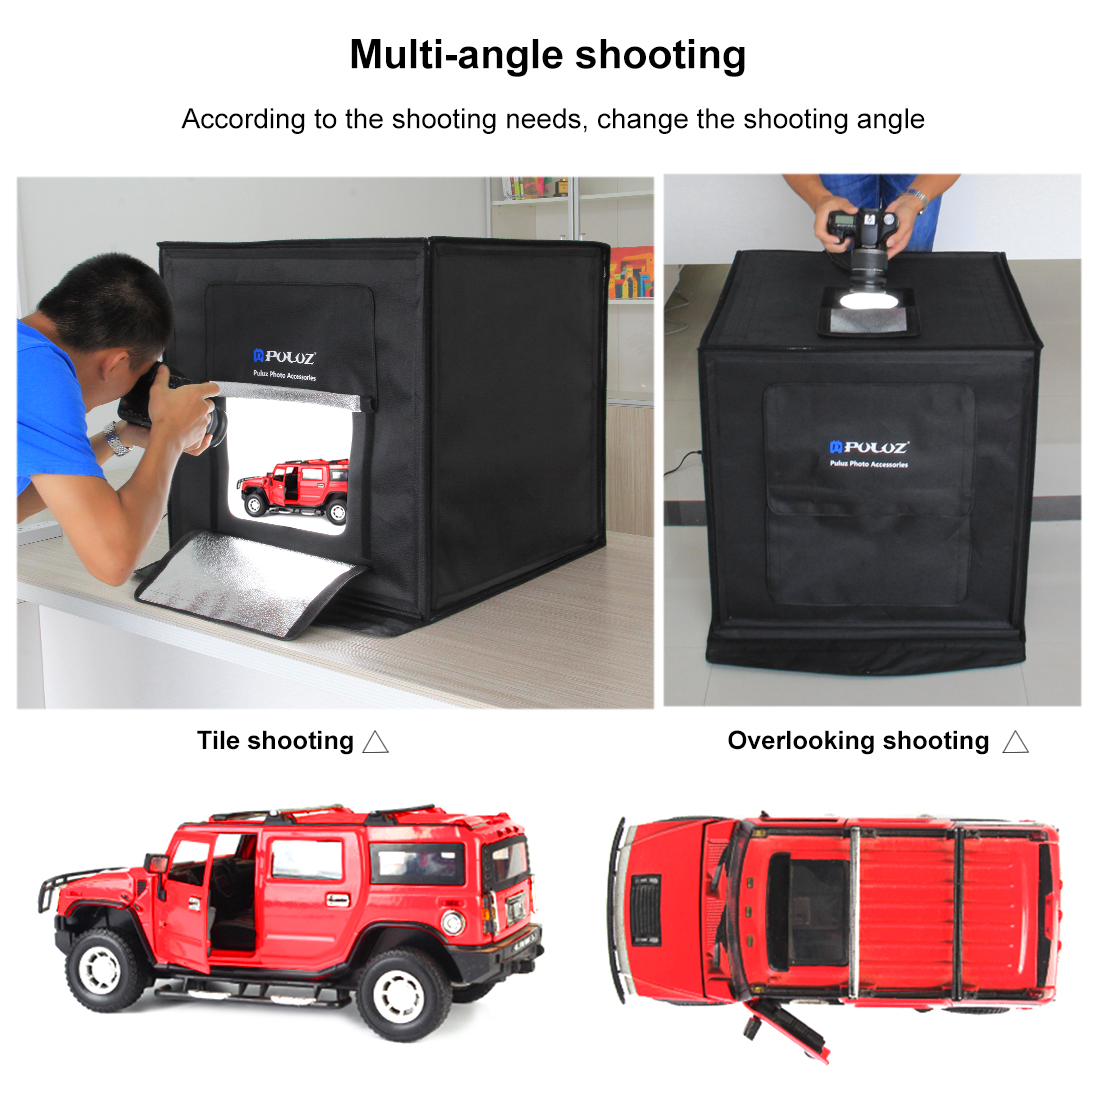 PULUZ Камера аксессуар Lightbox 60*60 см светодиодный фотостудия Softbox съемка Light Палатка АС Plug Мощность адаптер совместим с AU